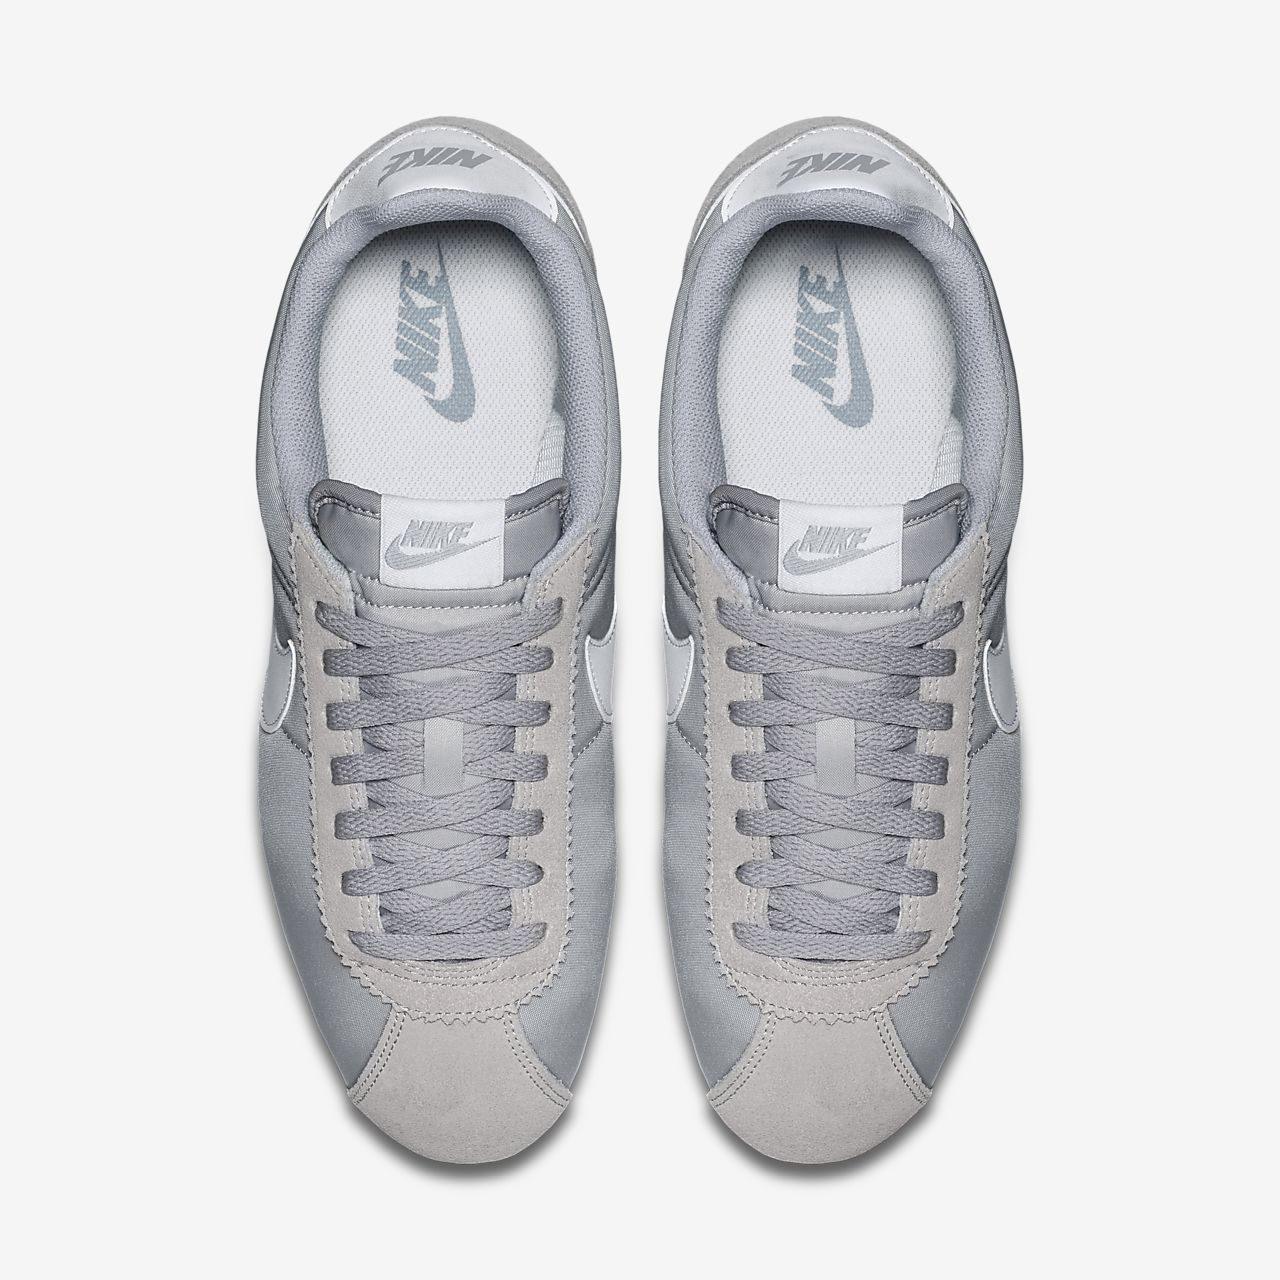 new styles 30ee6 798dd ... Chaussure mixte Nike Classic Cortez Nylon